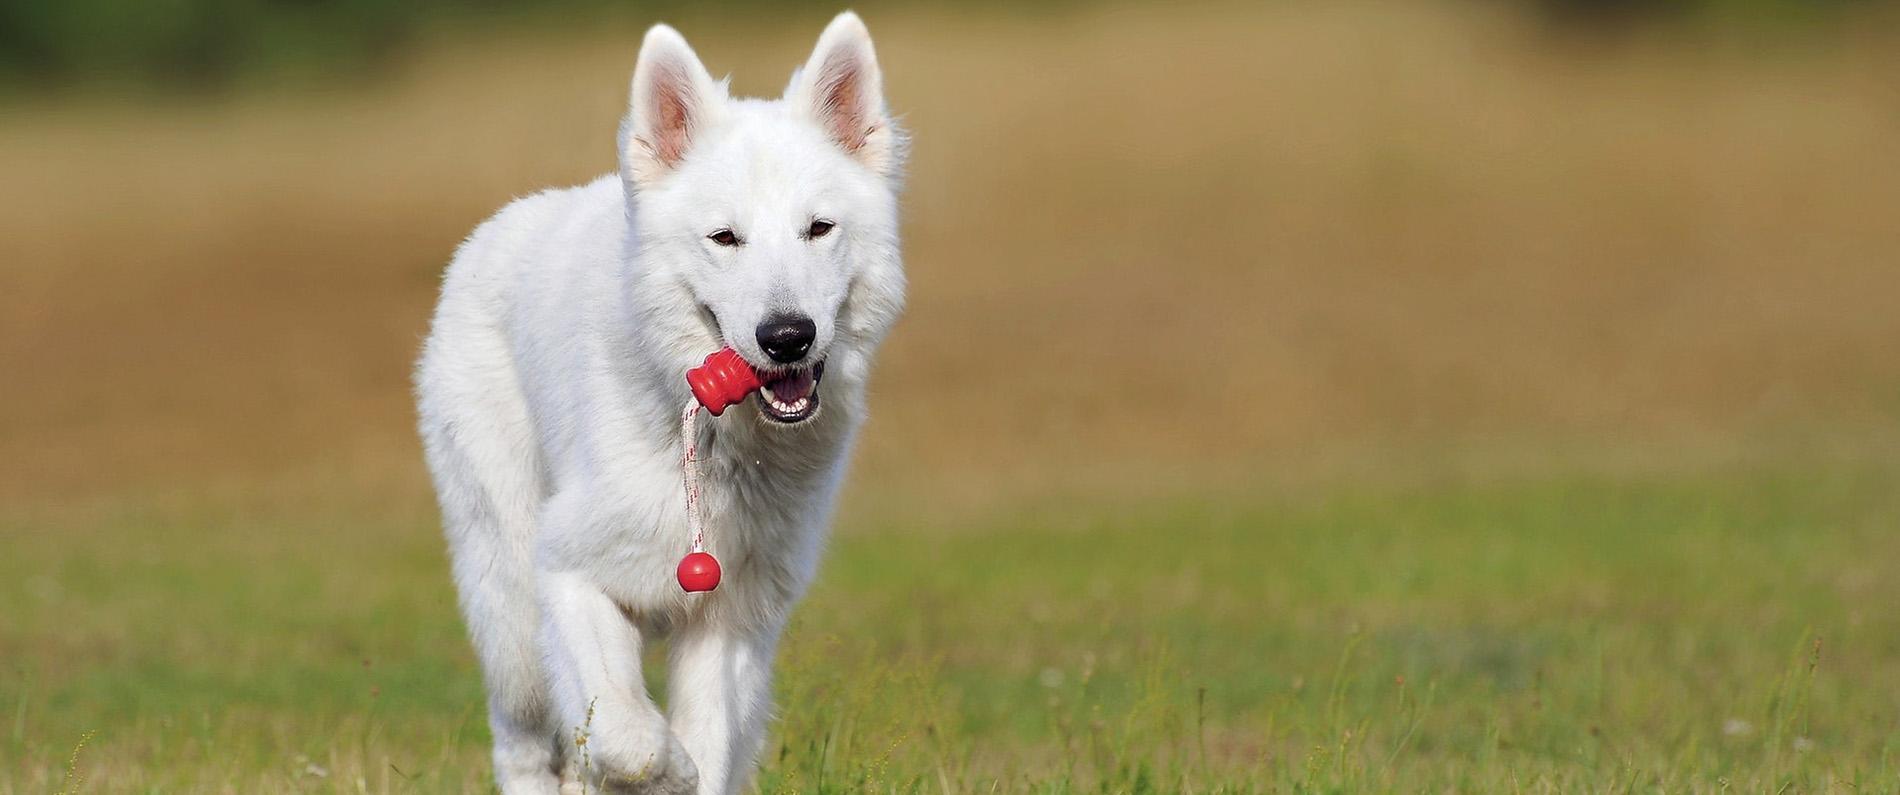 husky carrying dog training ball